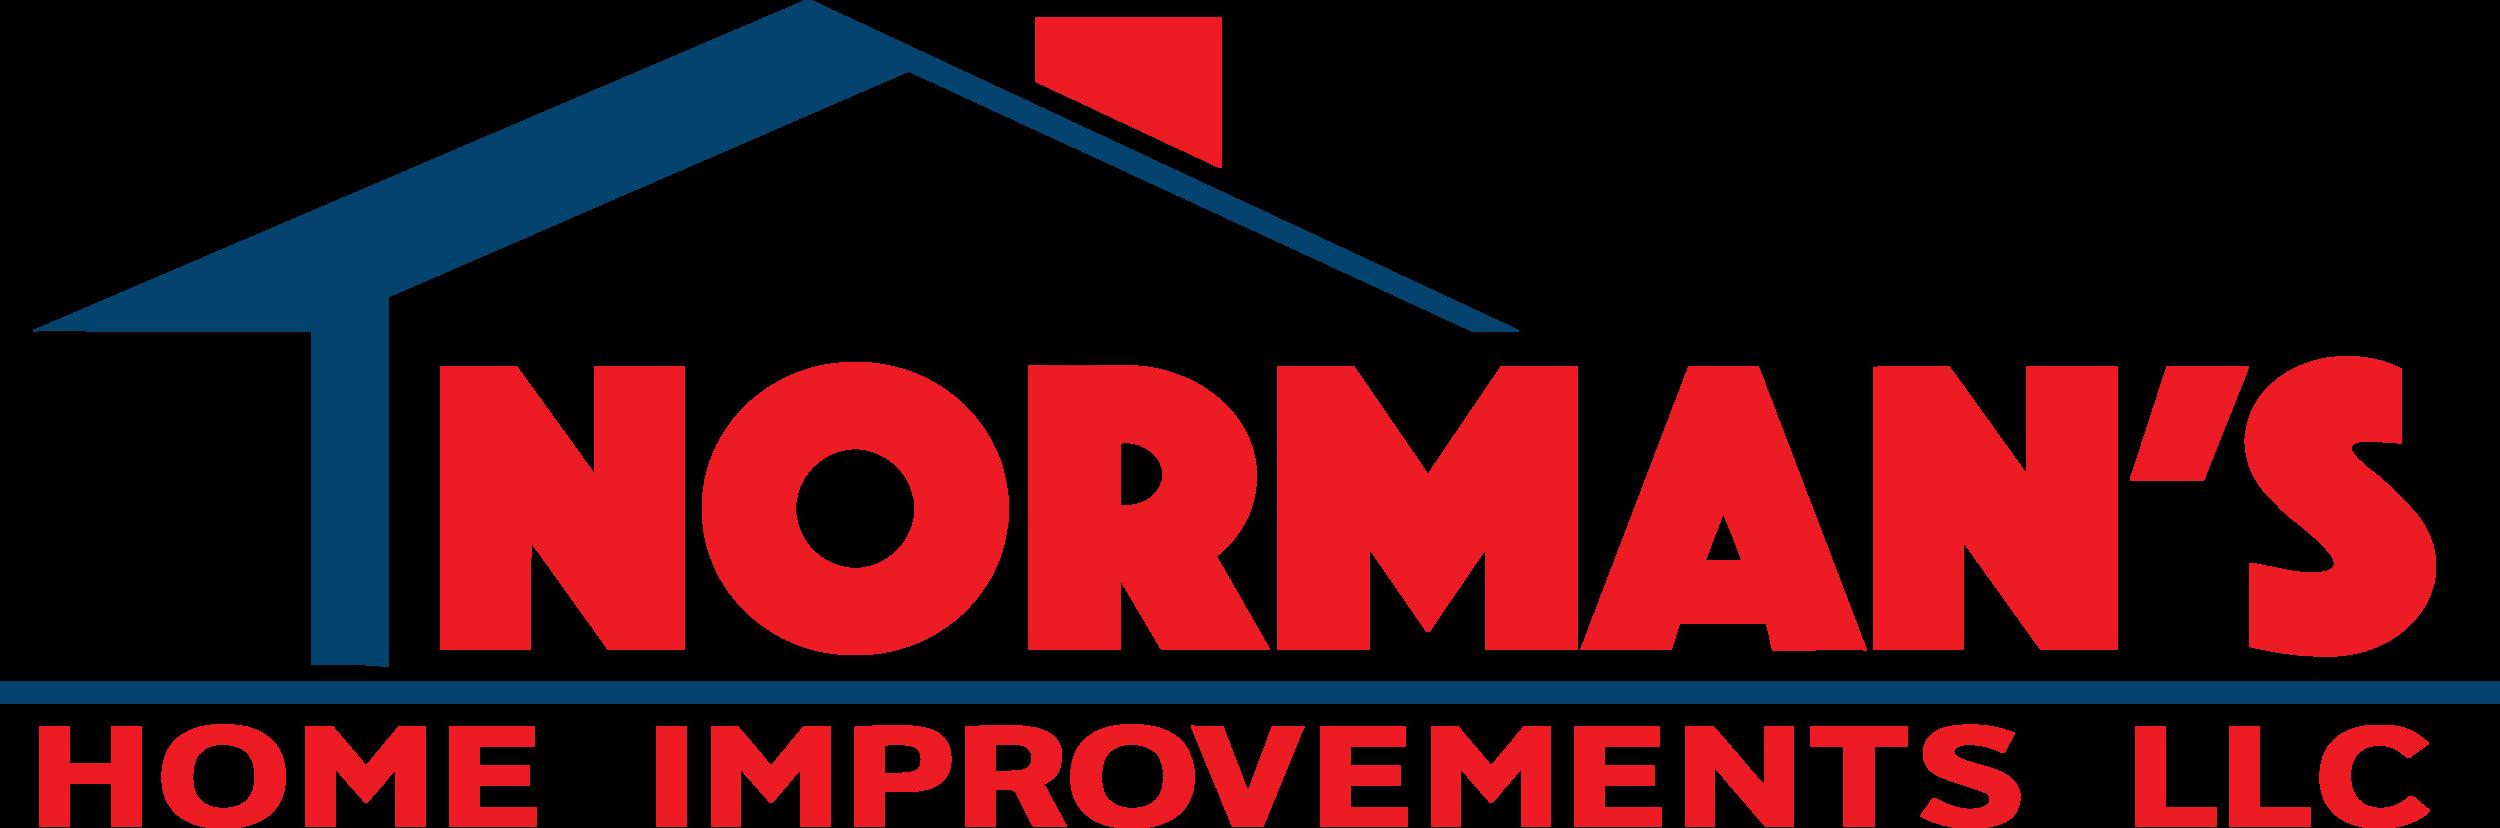 normans - color - logo.png